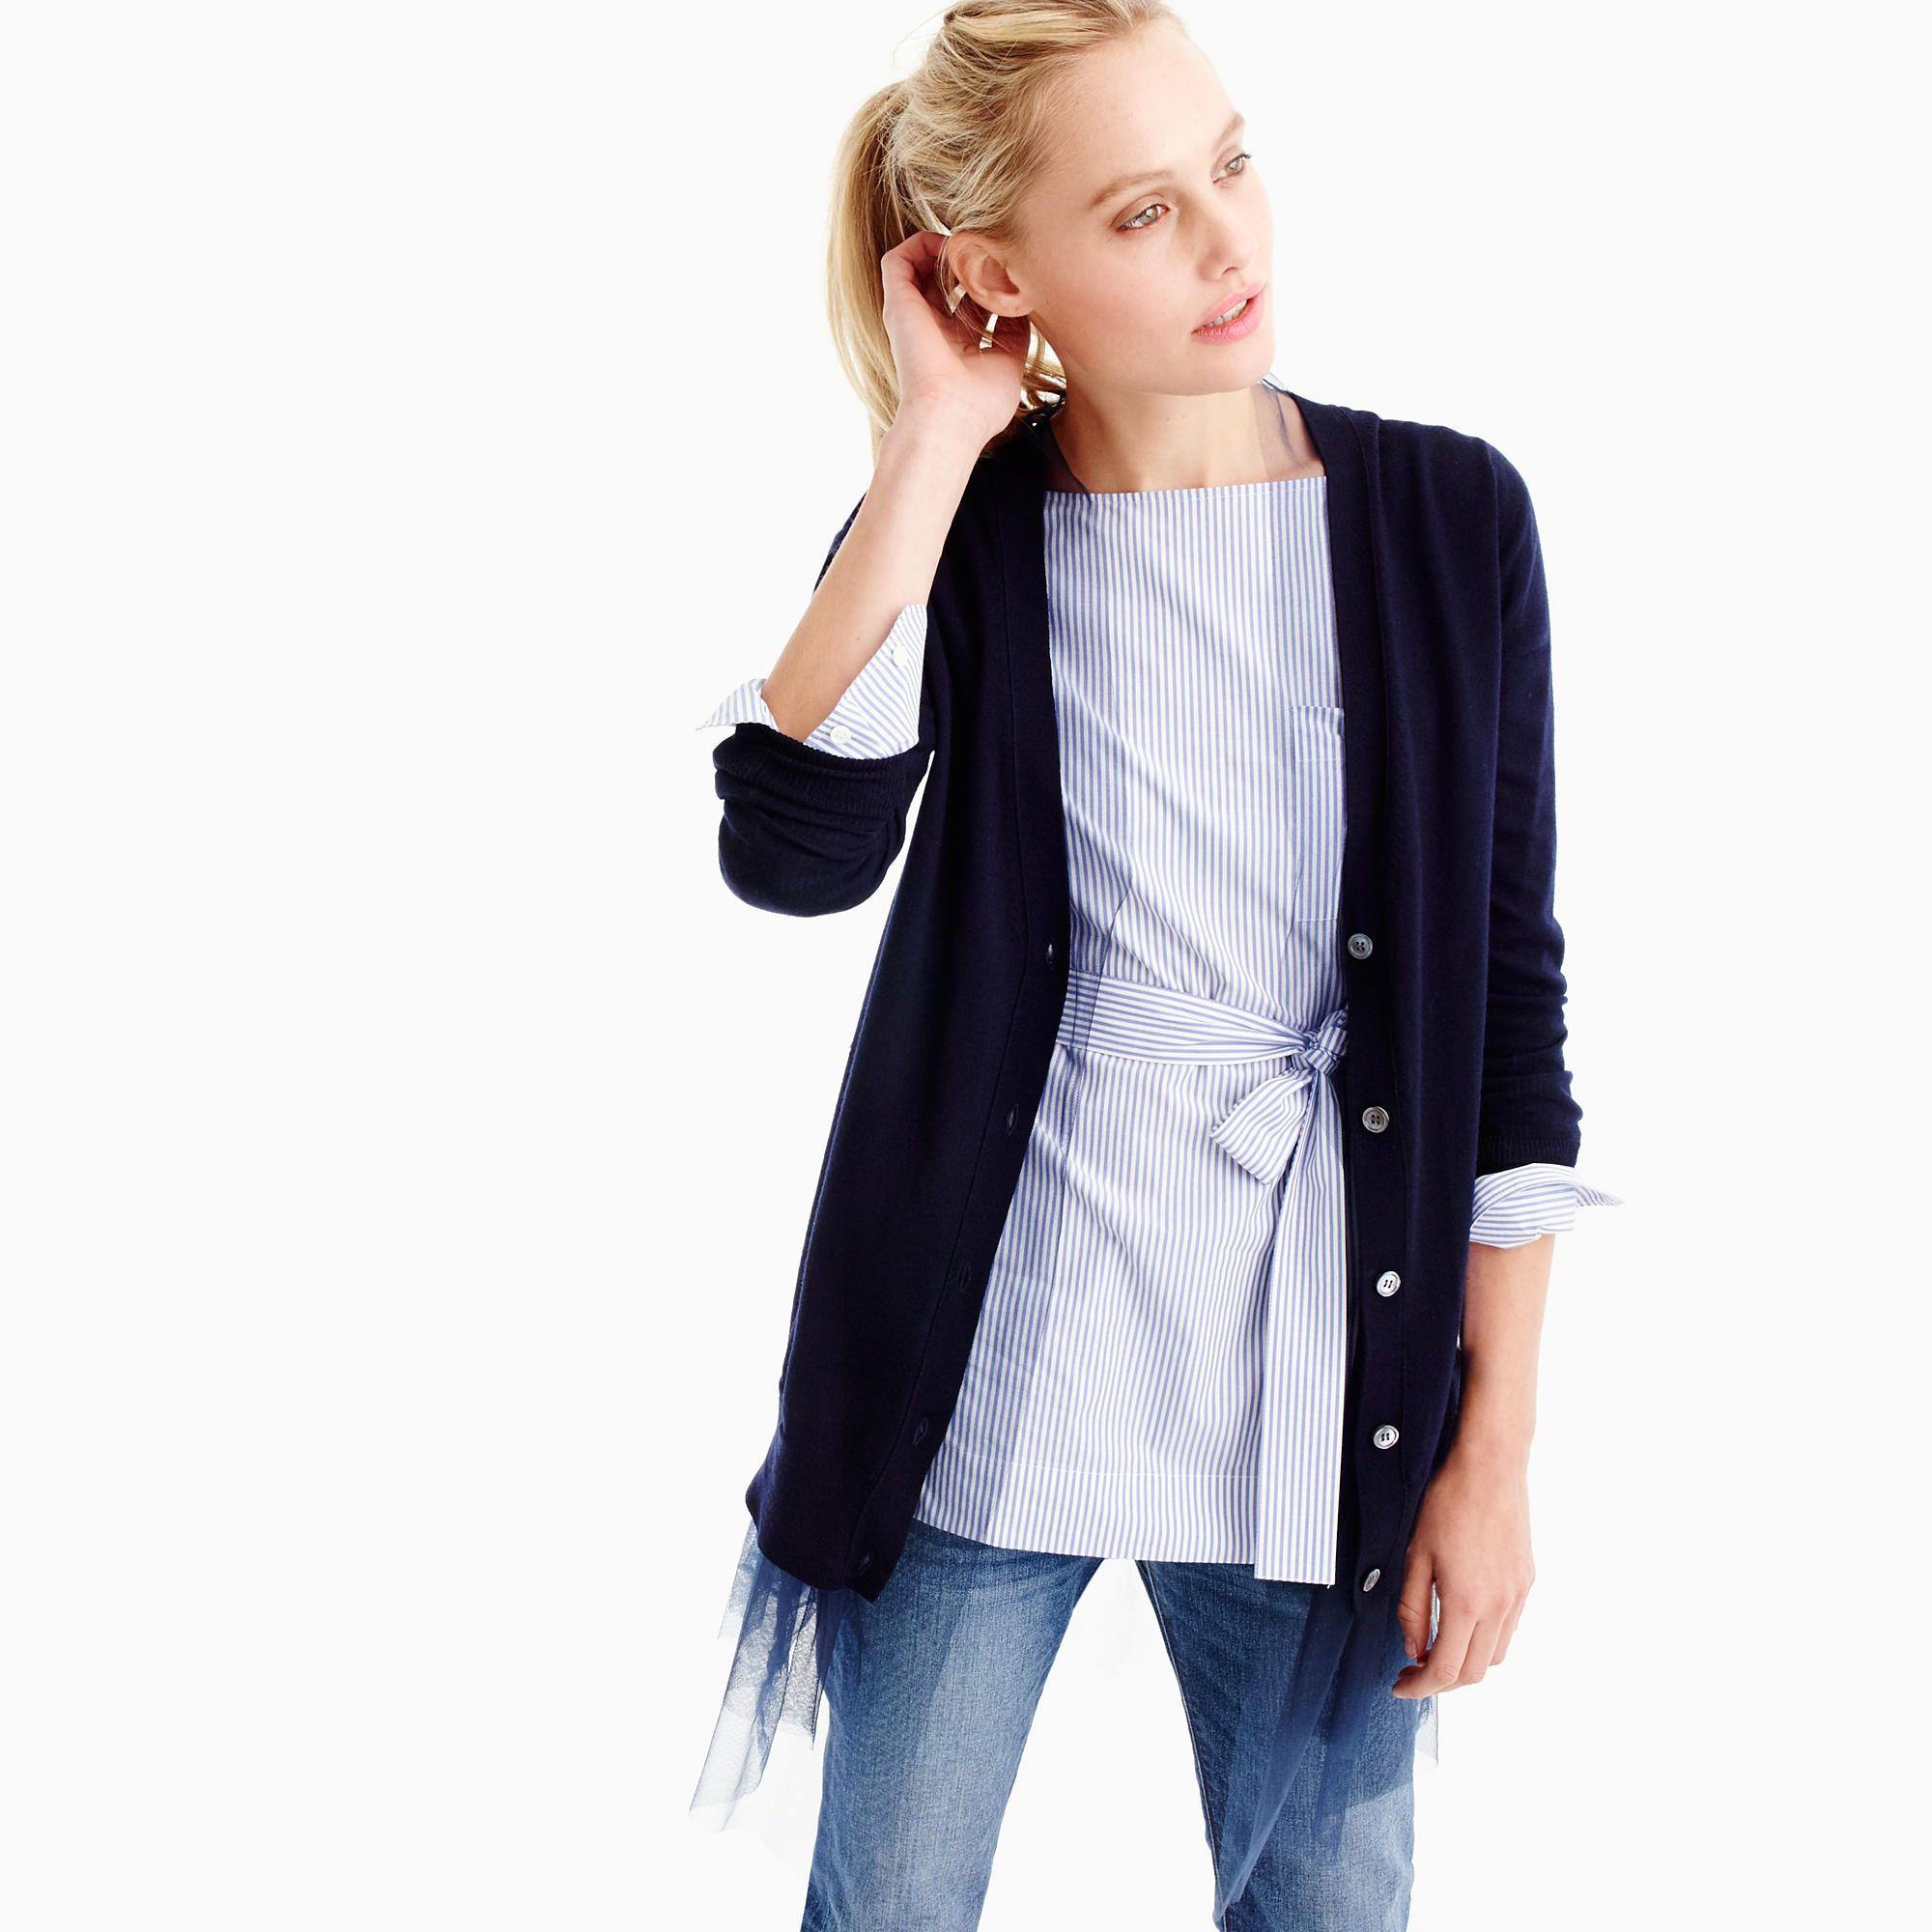 Tulle-hem cardigan sweater : Women sweaters | J.Crew | J Crew ...